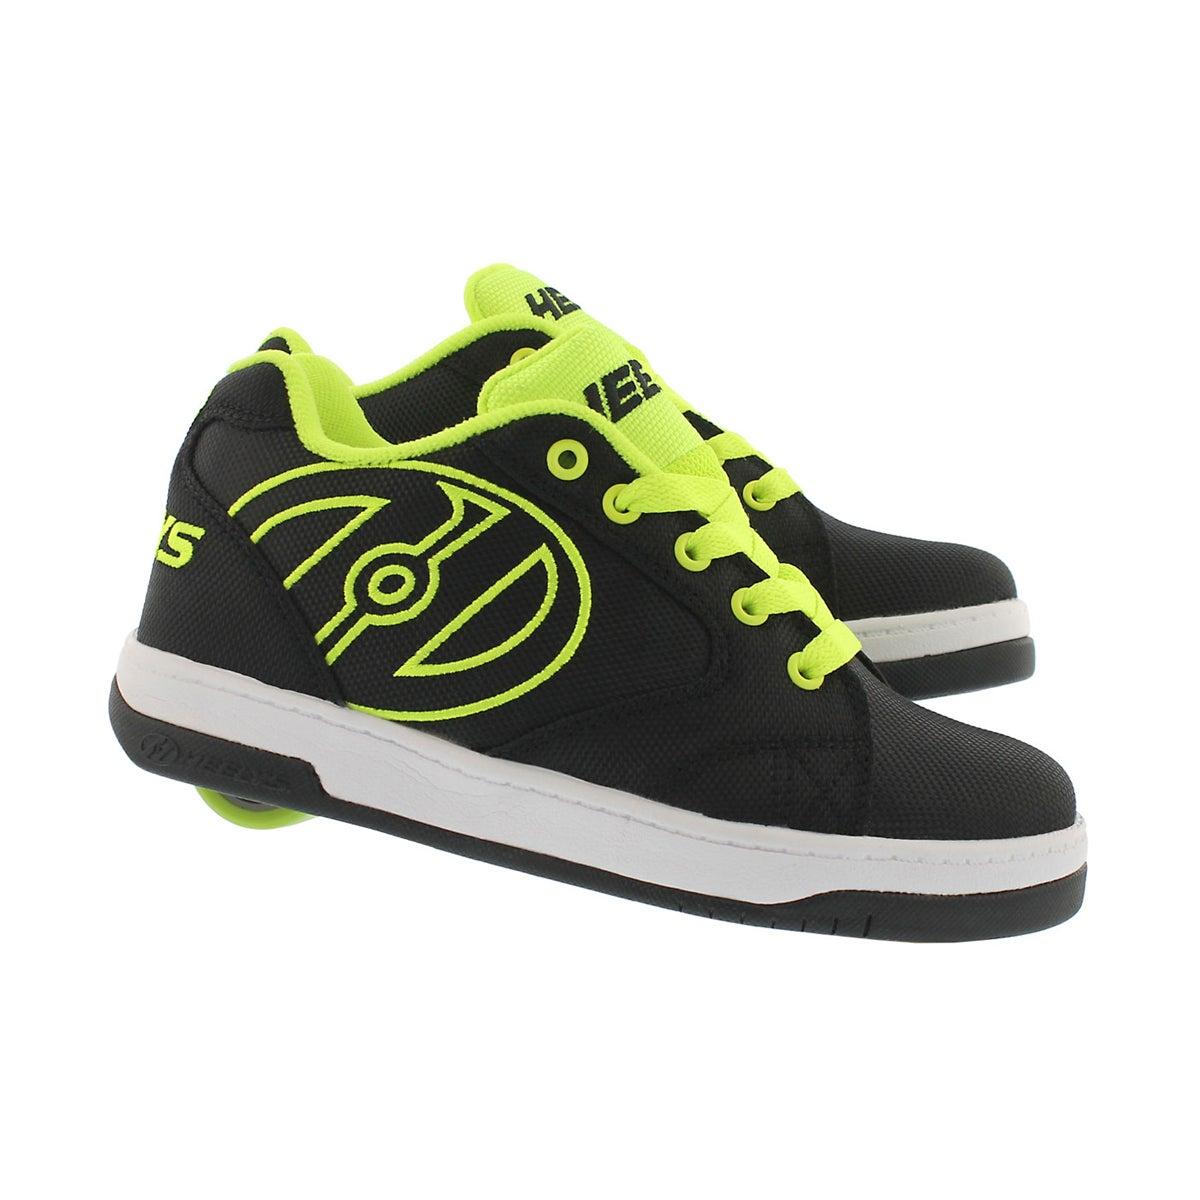 Bys Propel 2.0 blk/yellow skate sneaker